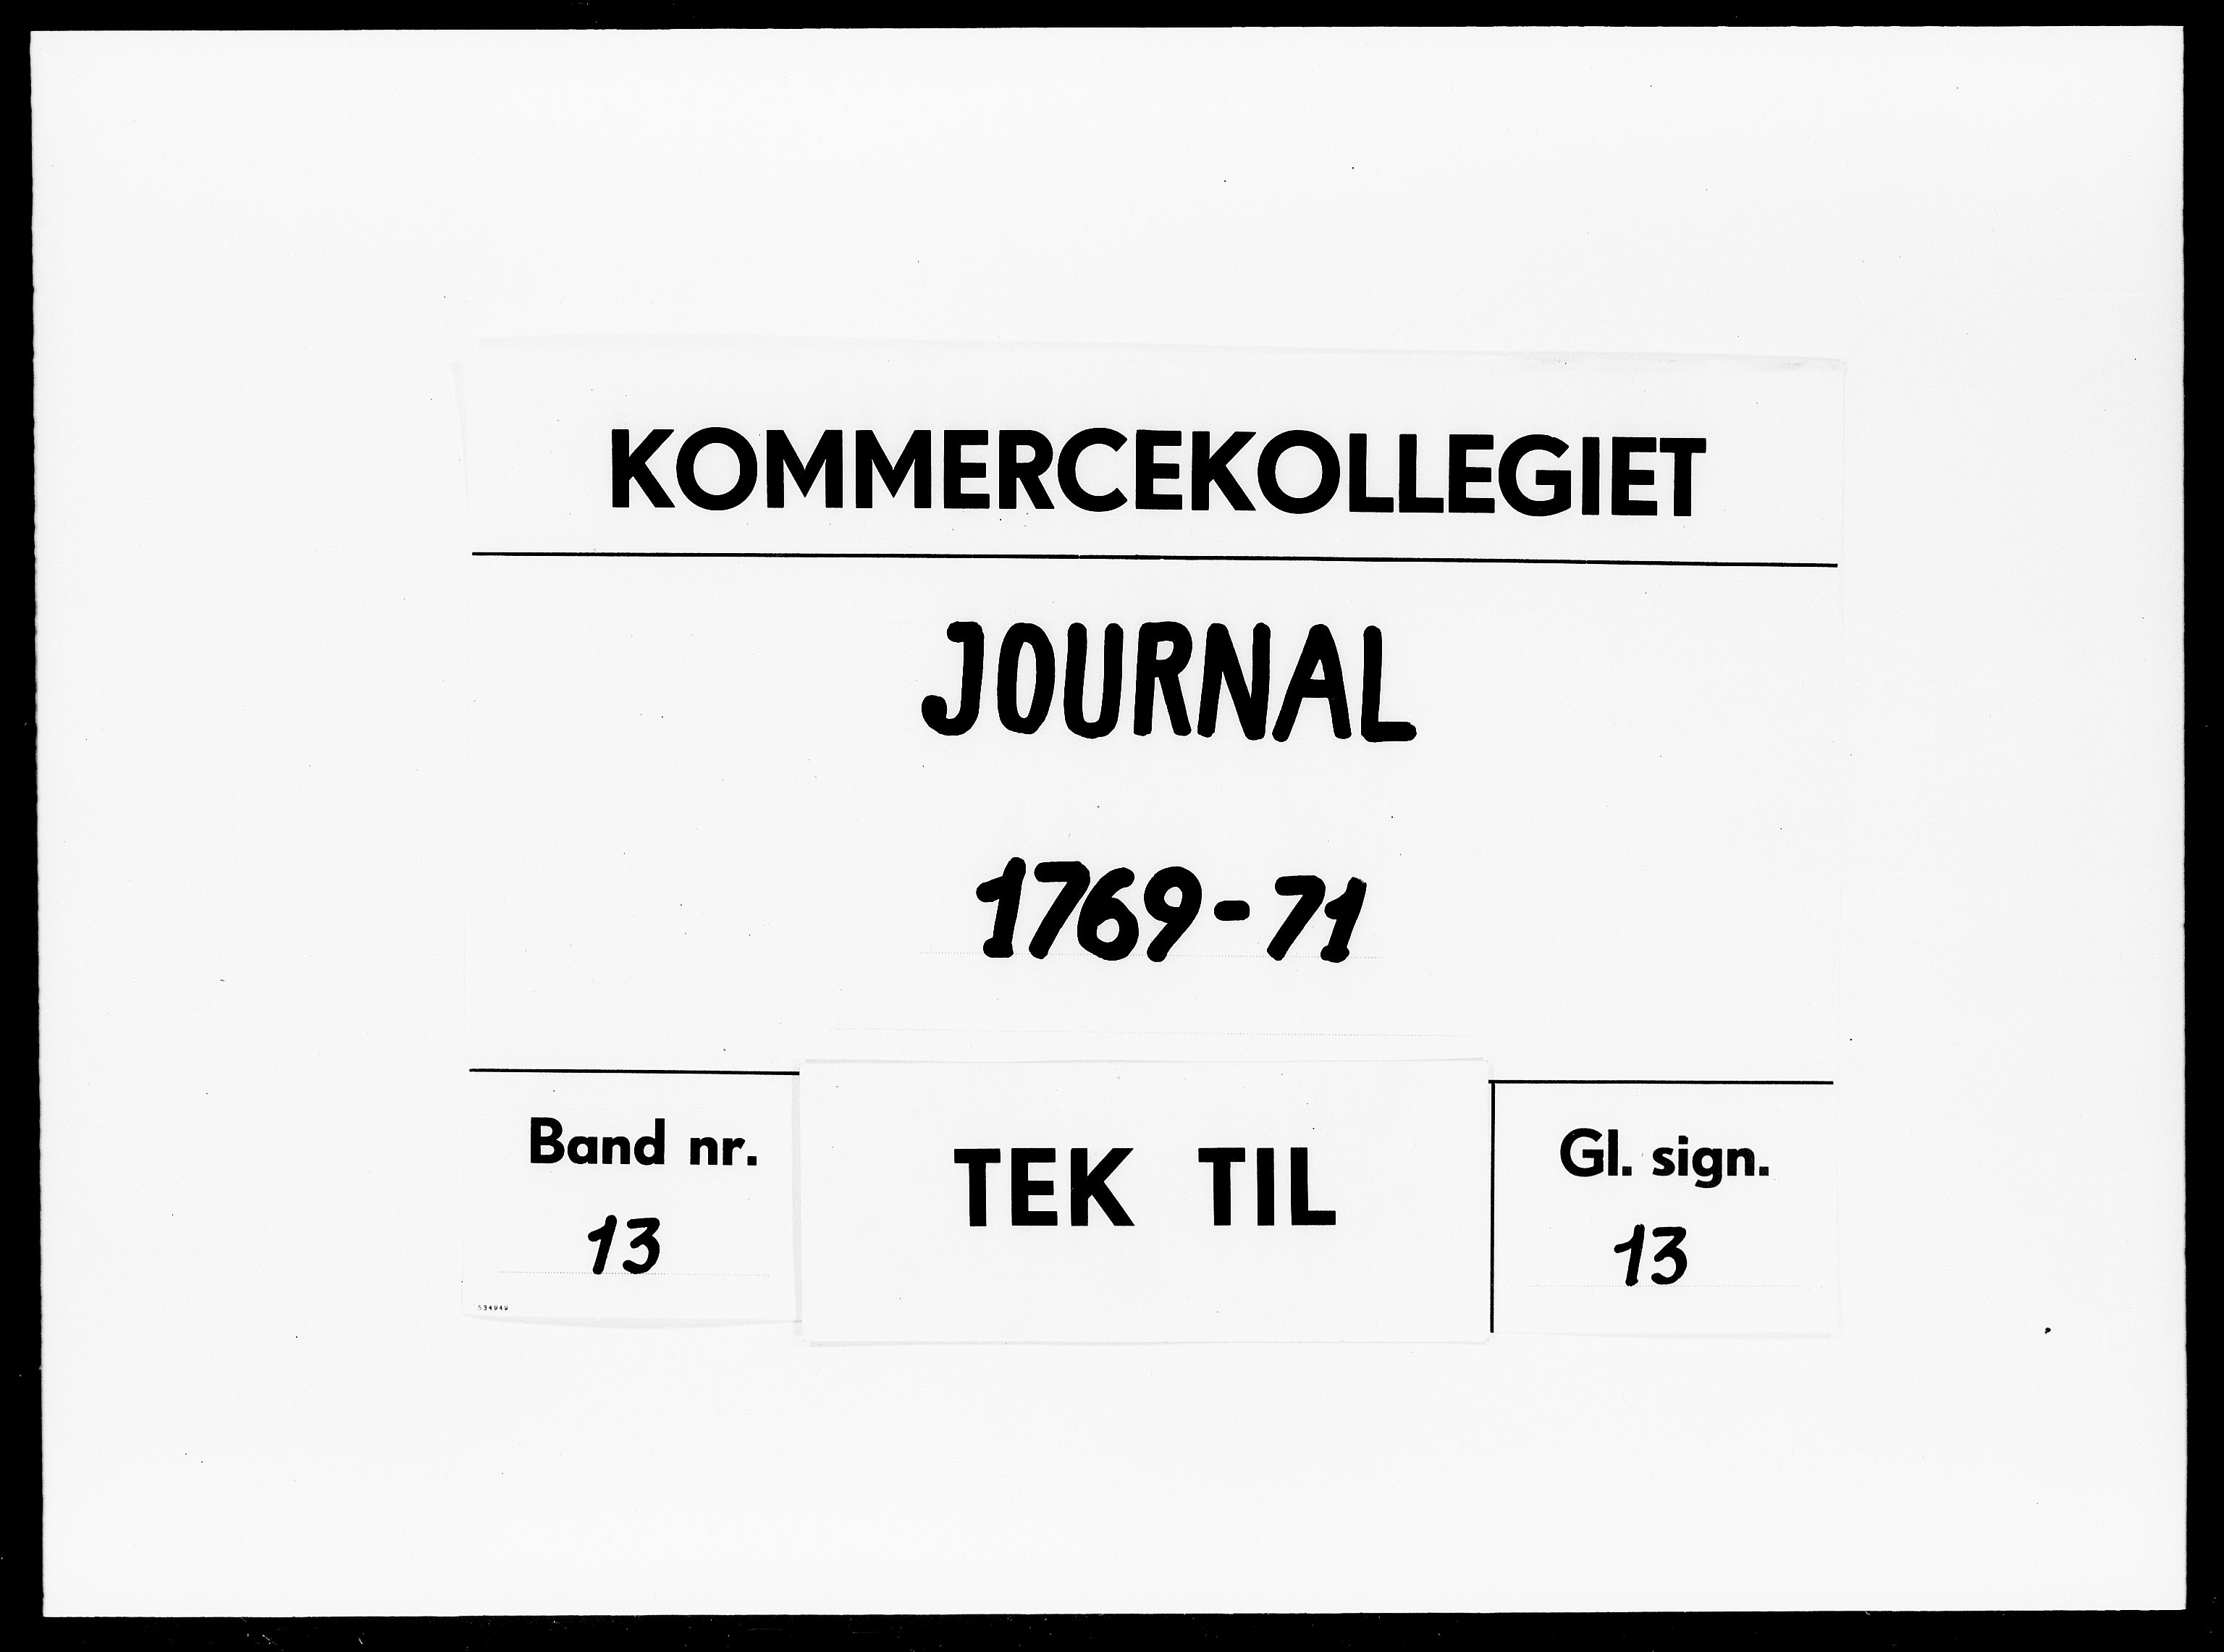 DRA, Kommercekollegiet, Dansk-Norske Sekretariat, -/61: Journal nr. 13, 1769-1771